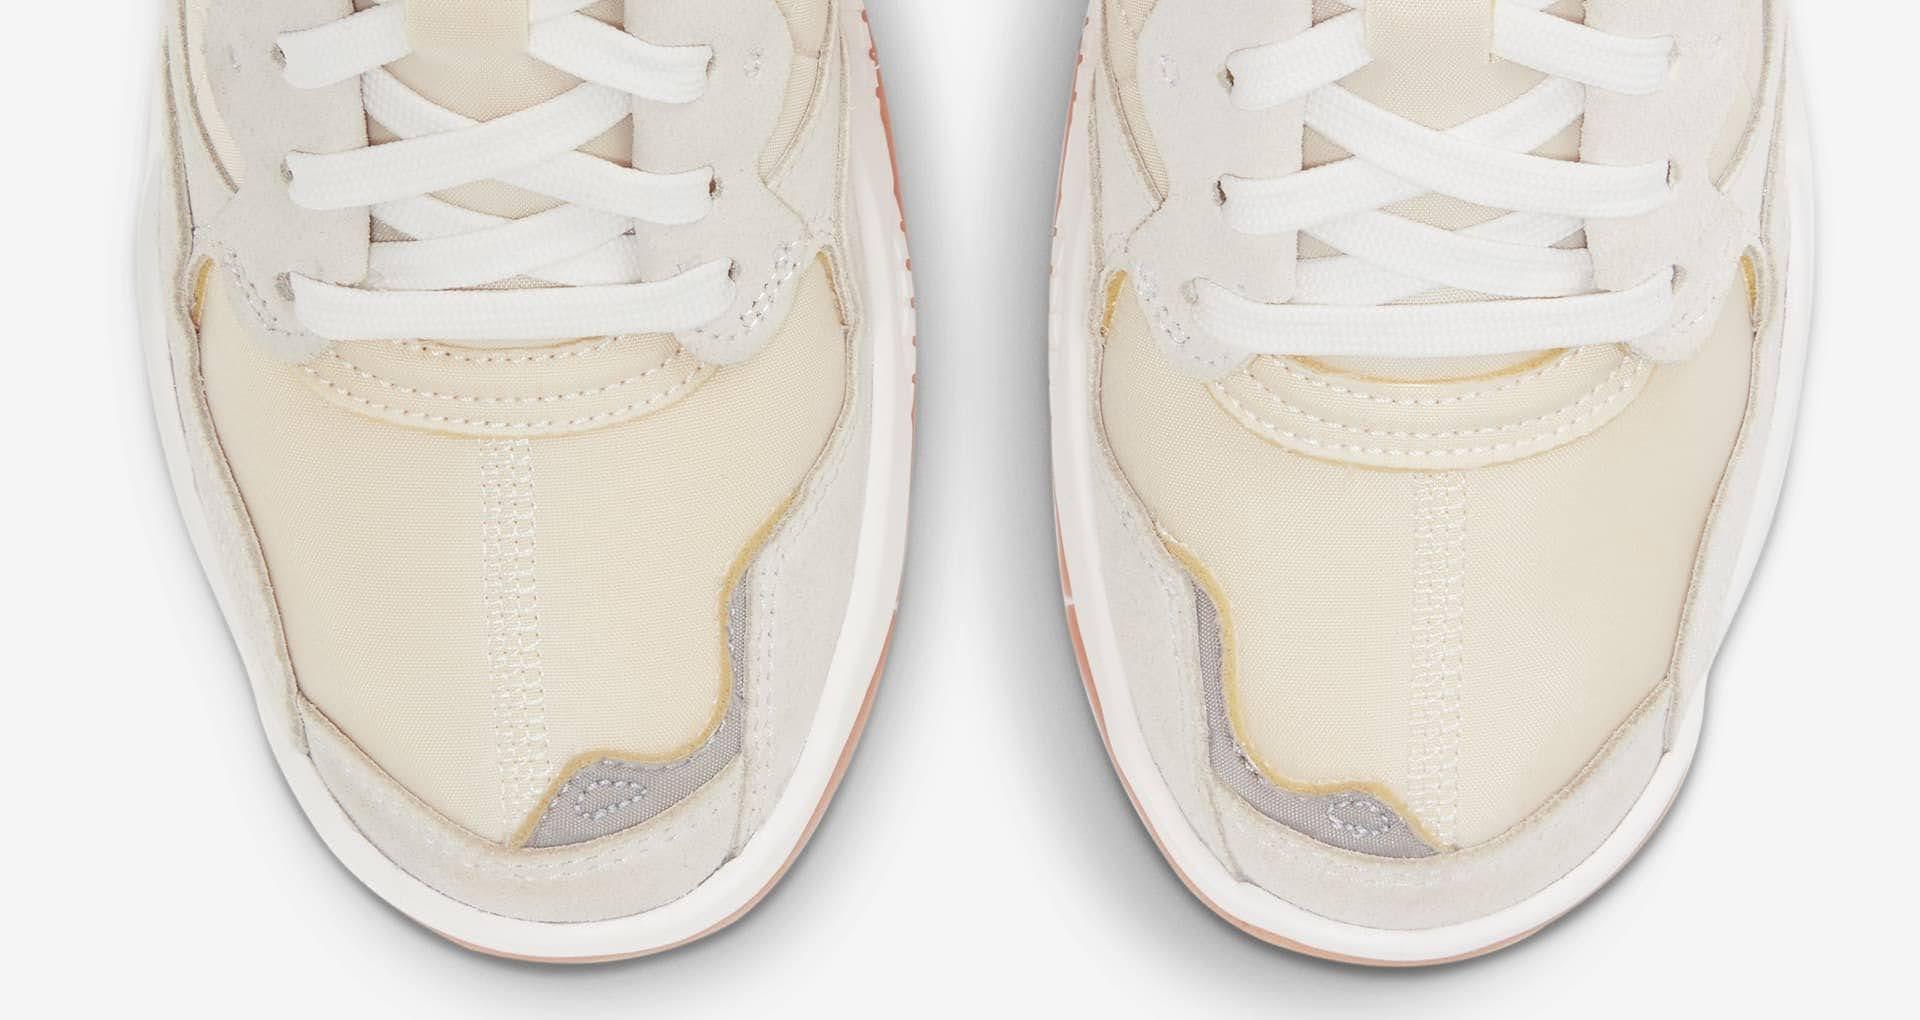 Nike-jordan-brand-ma-2-air-max-200-and-women-s-future-primal-apparel nike-womens-jordan-ma2-future-beginnings-DC7729-100-toe